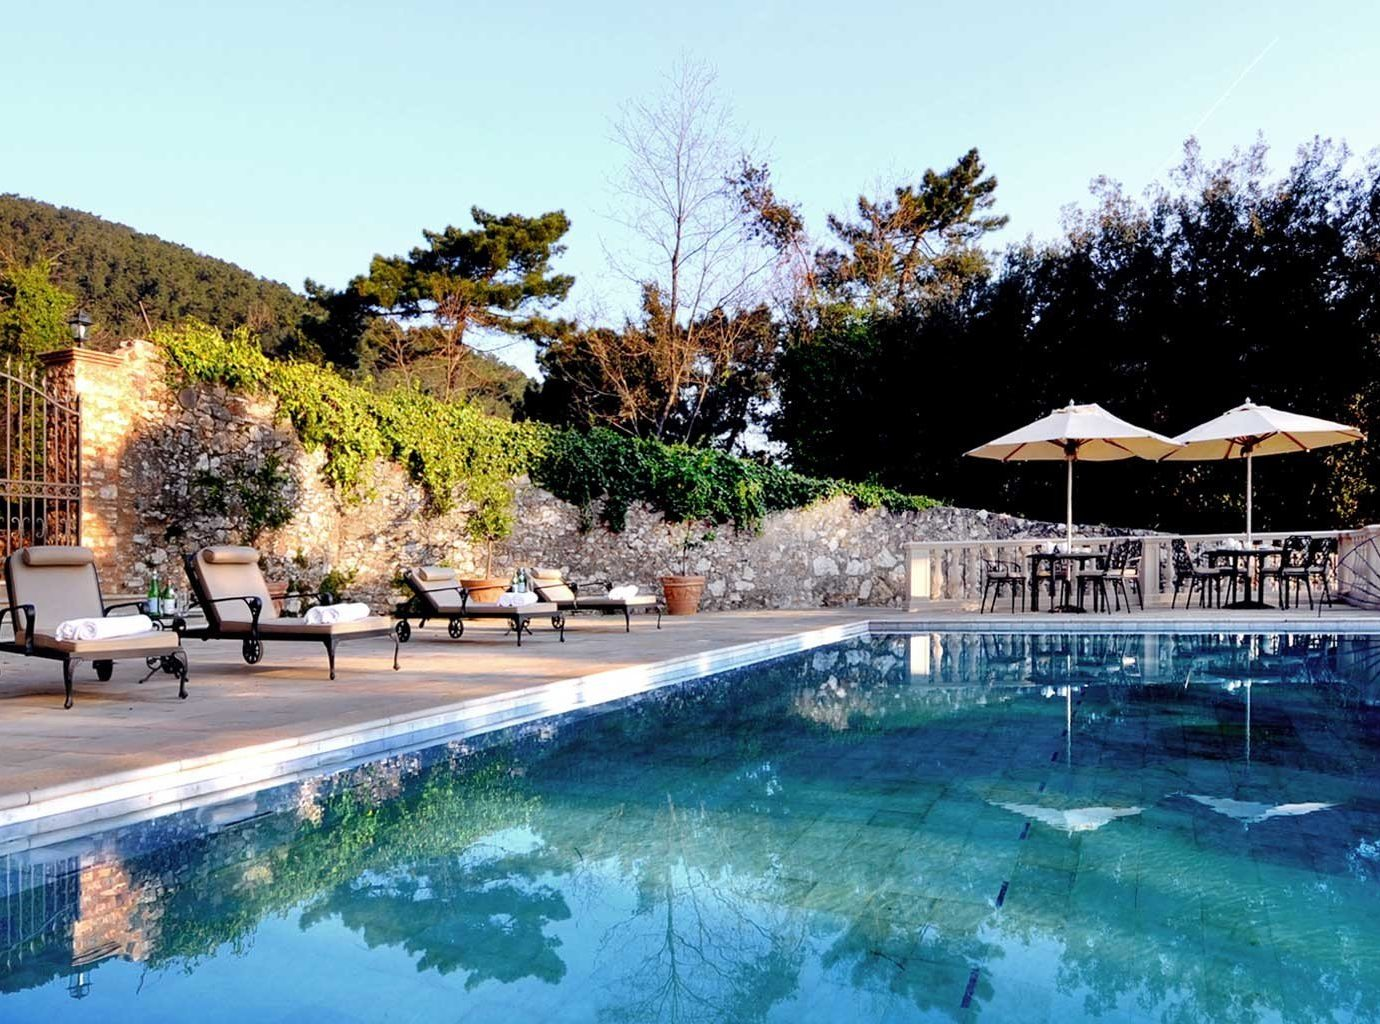 Elegant Italy Luxury Pool Trip Ideas Villa tree outdoor sky swimming pool leisure property Resort estate resort town backyard bathtub several day